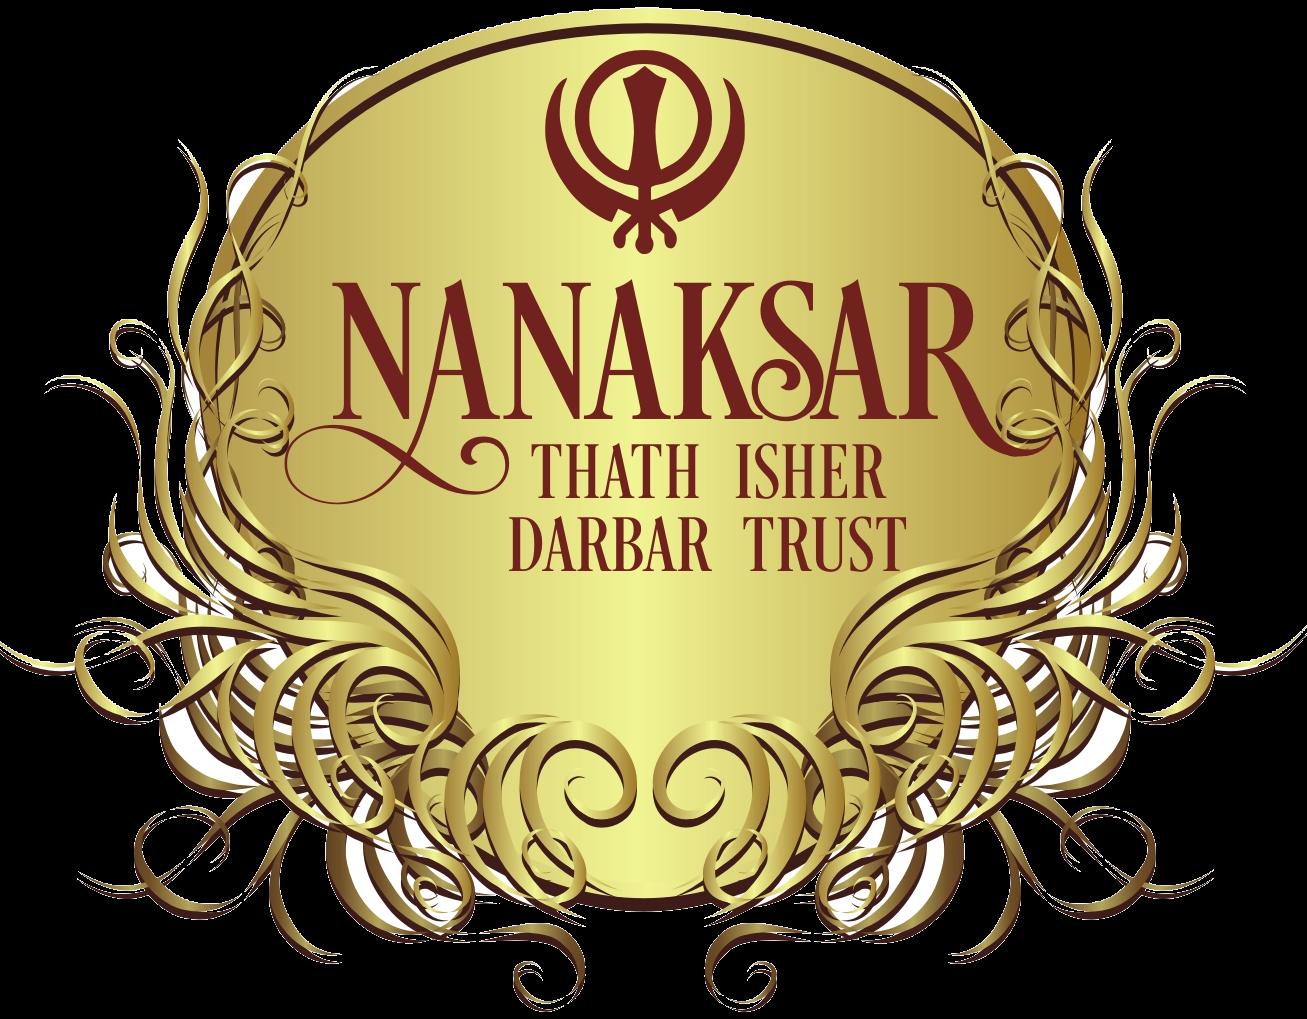 Nanaksar Thath Isher Darbar